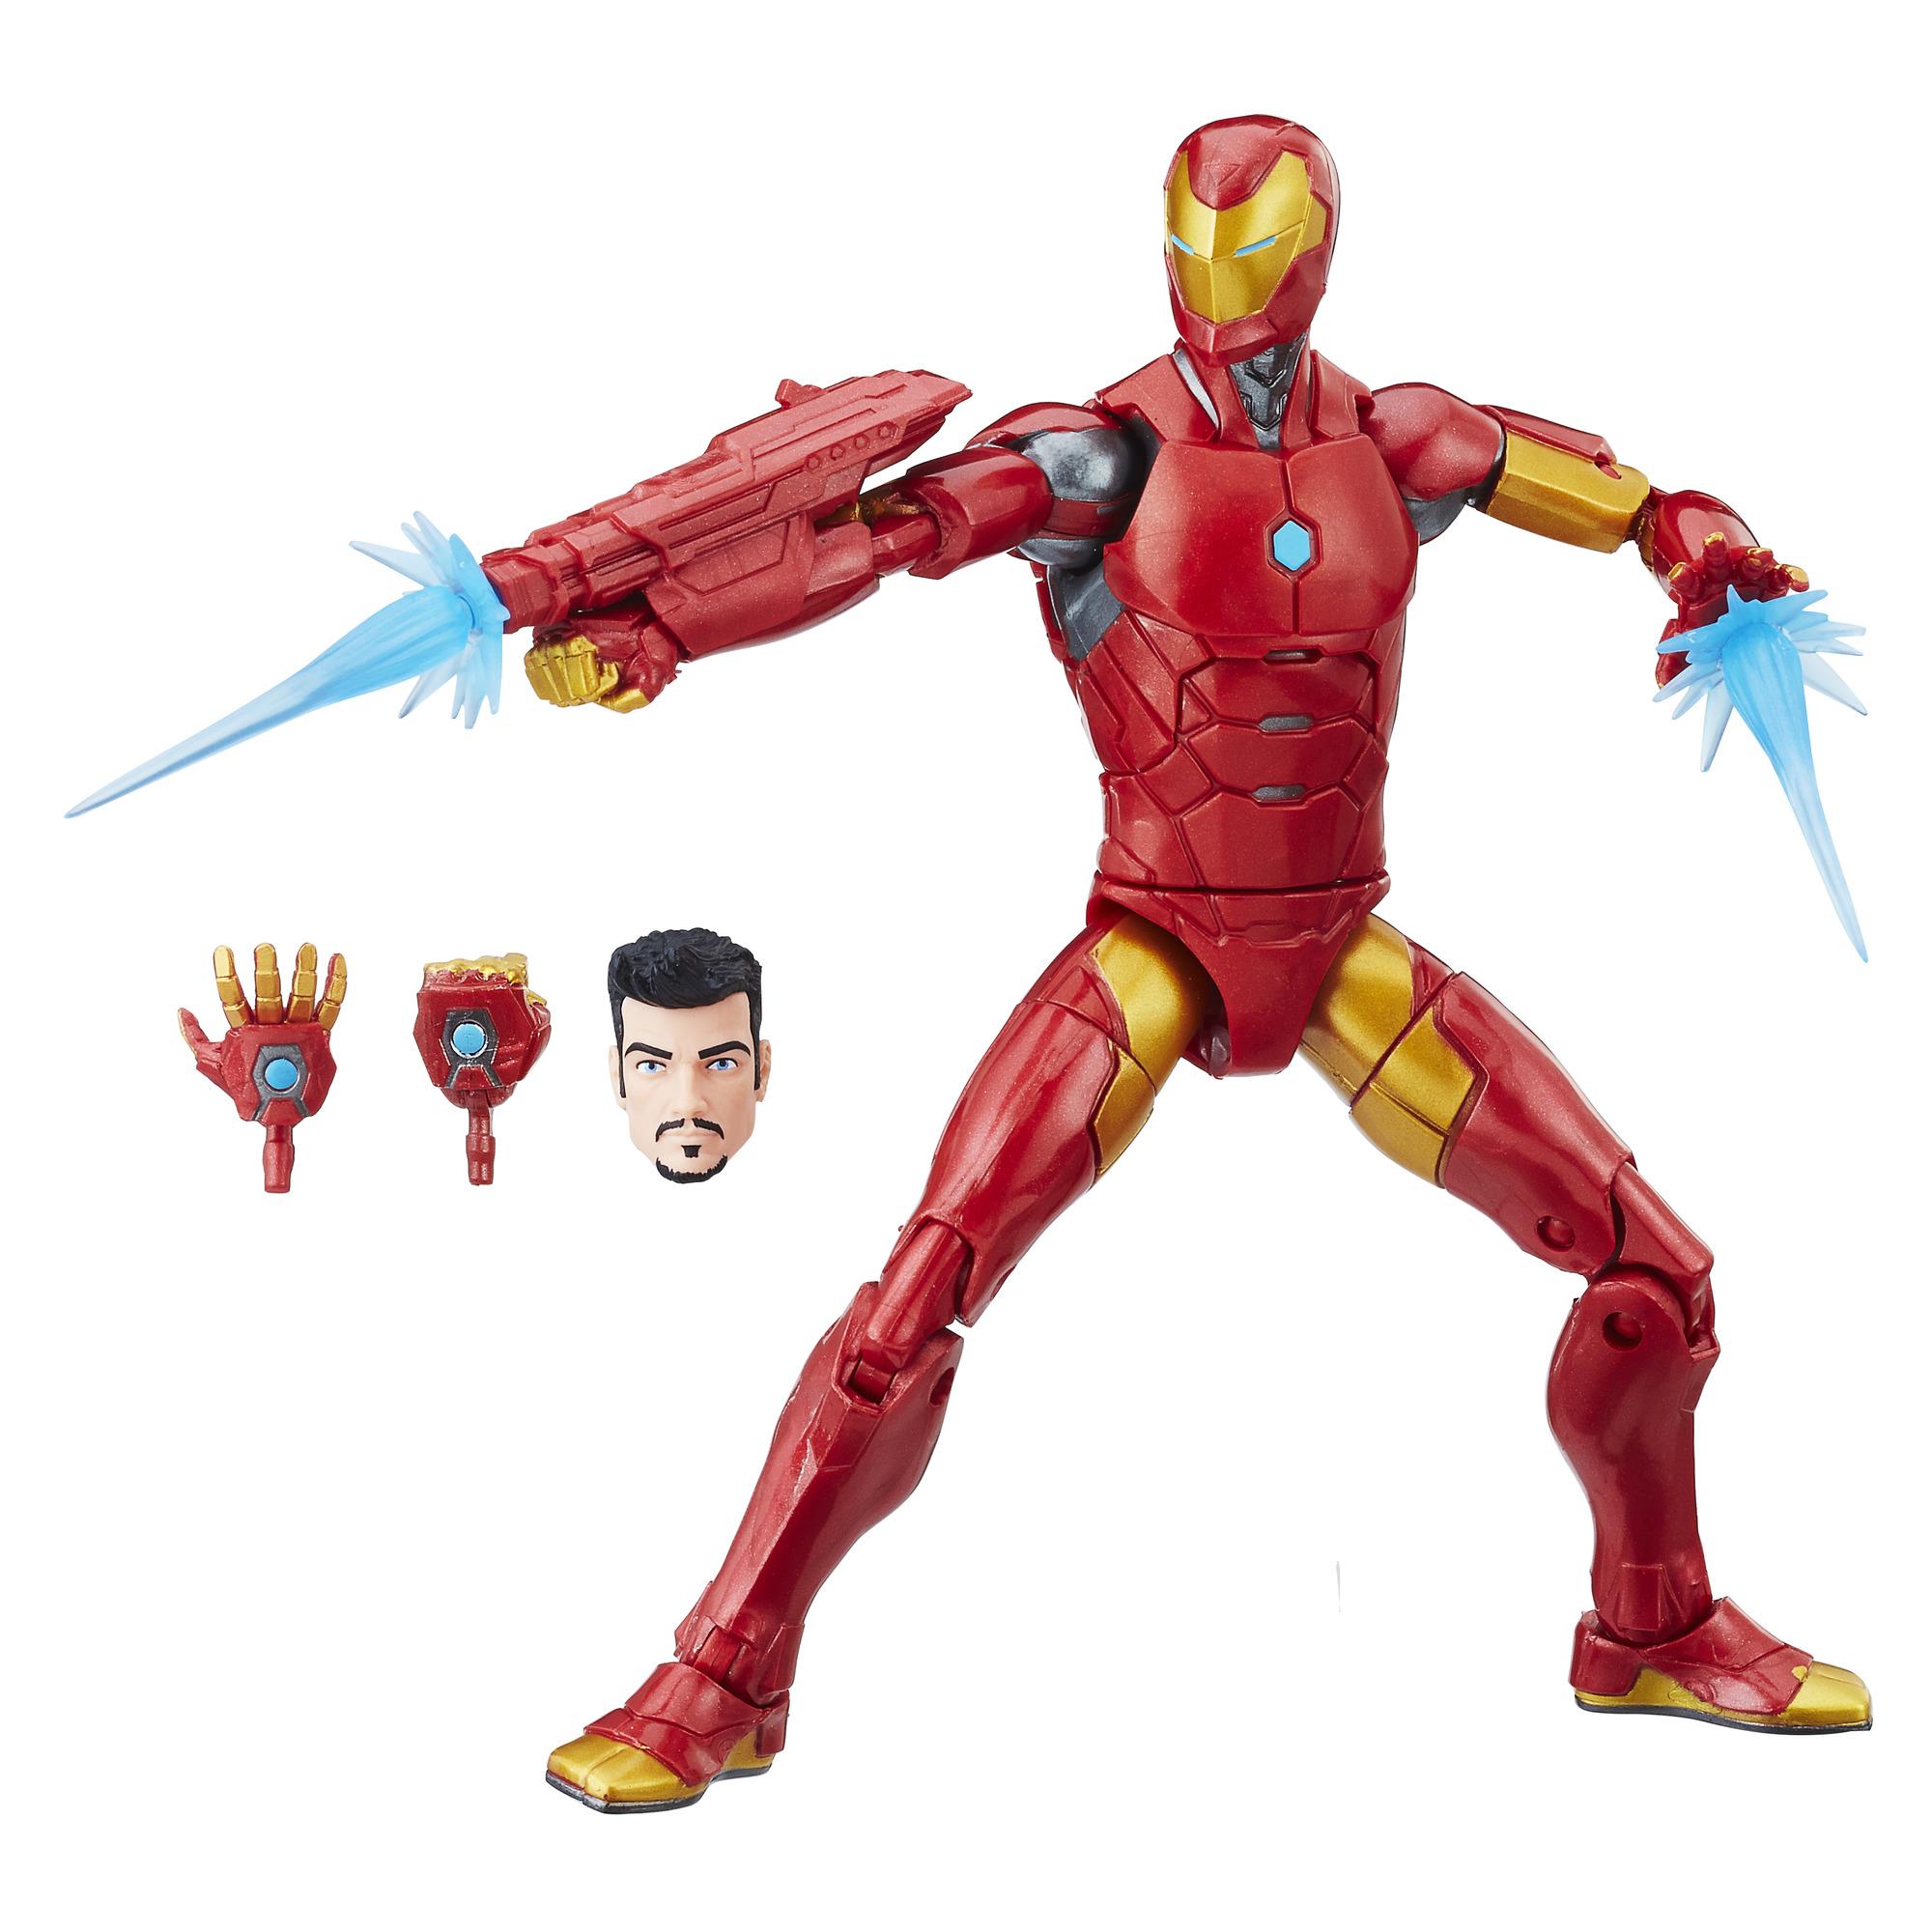 Marvel Black Panther 6-inch Legends Series Iron Man